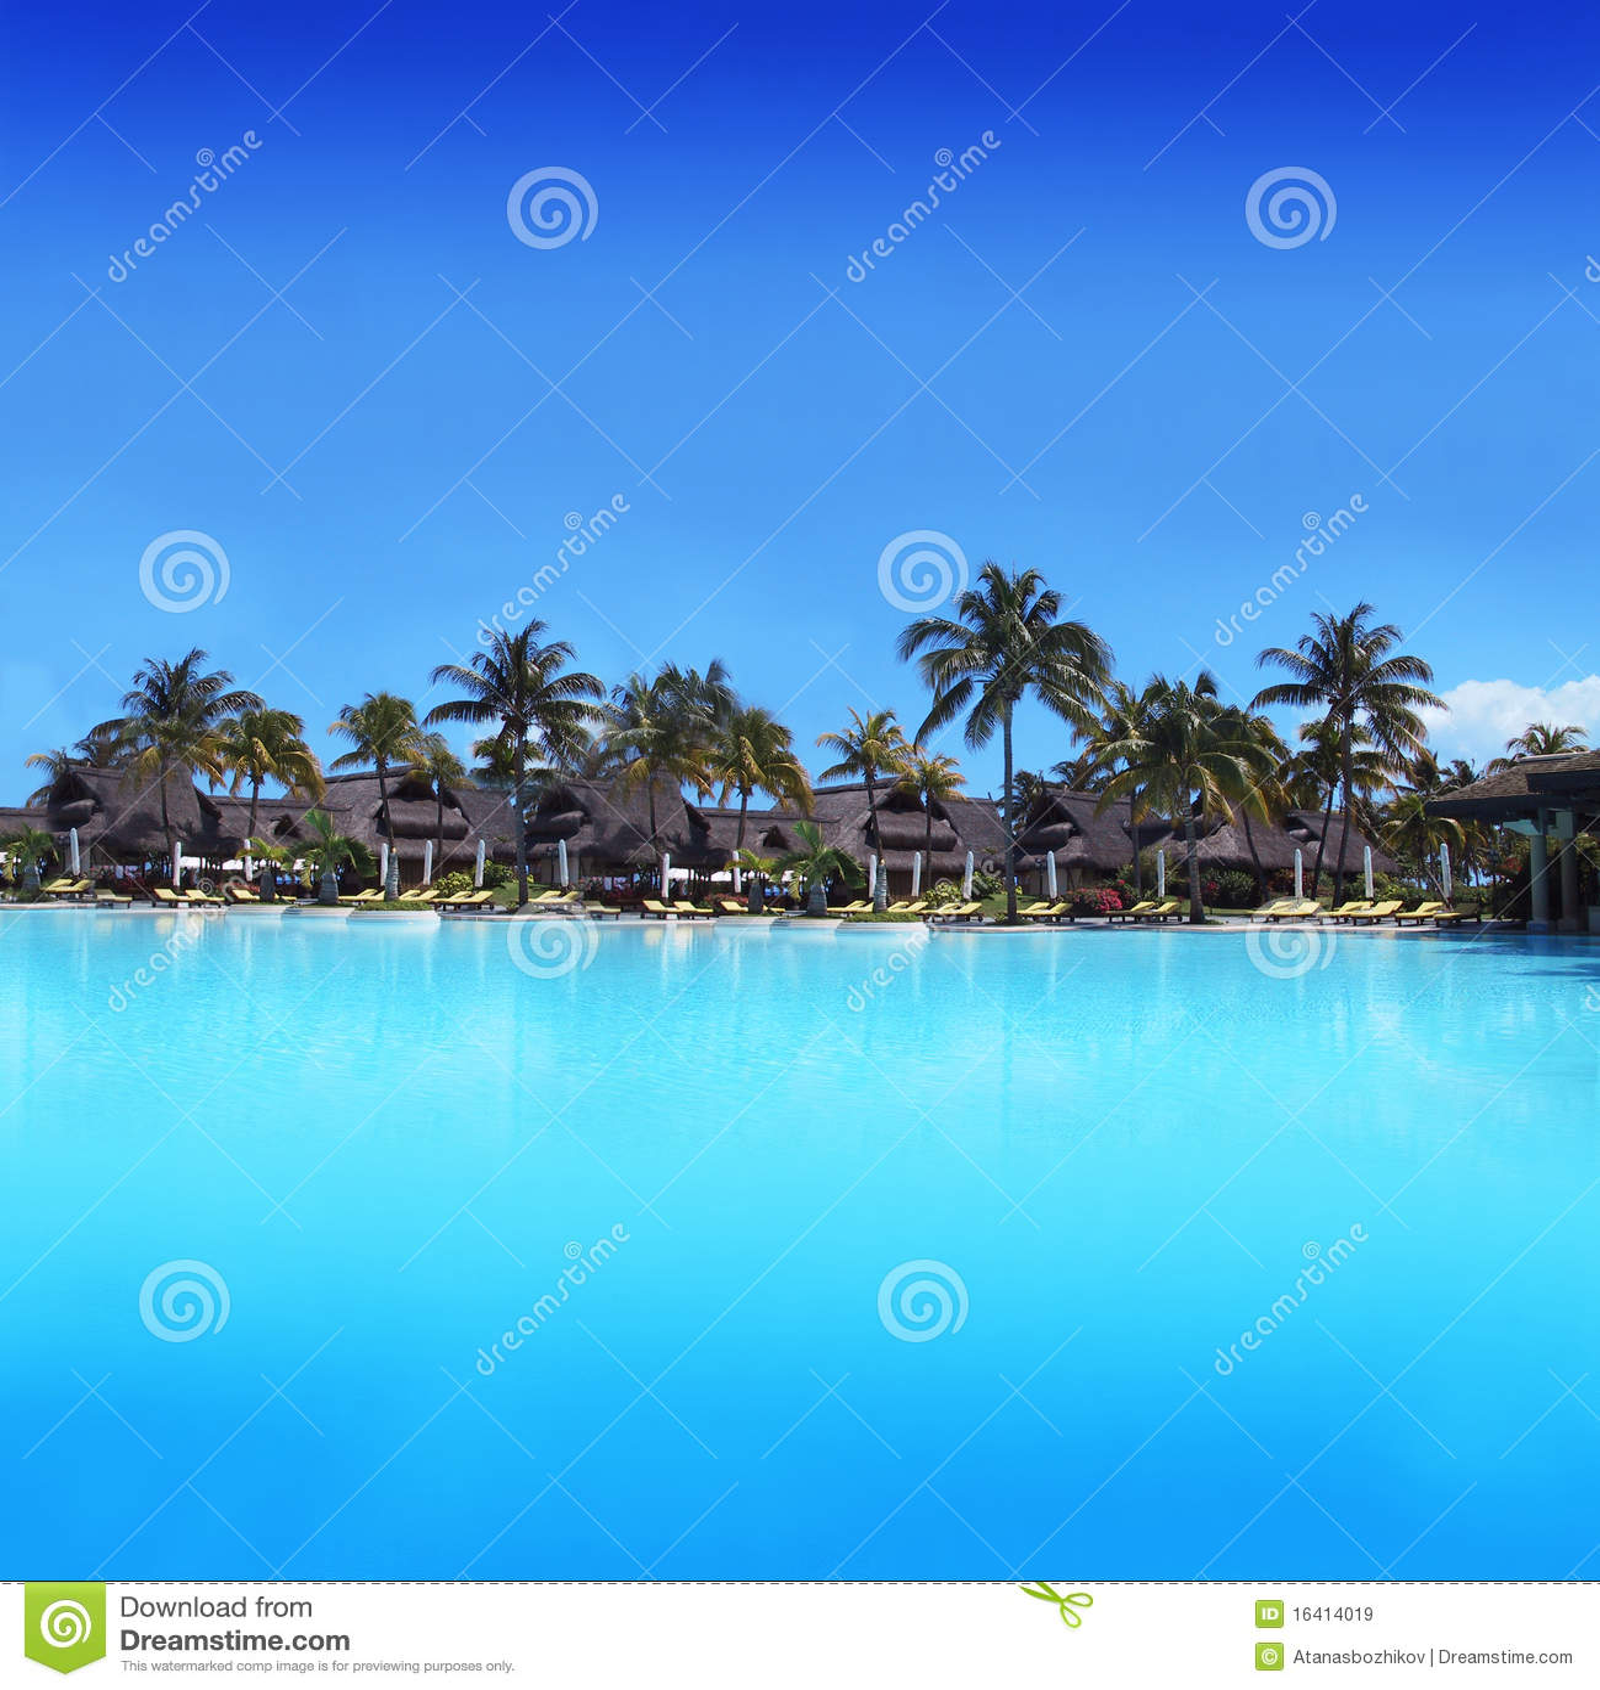 Exotic Vacation Resort In Mauritius